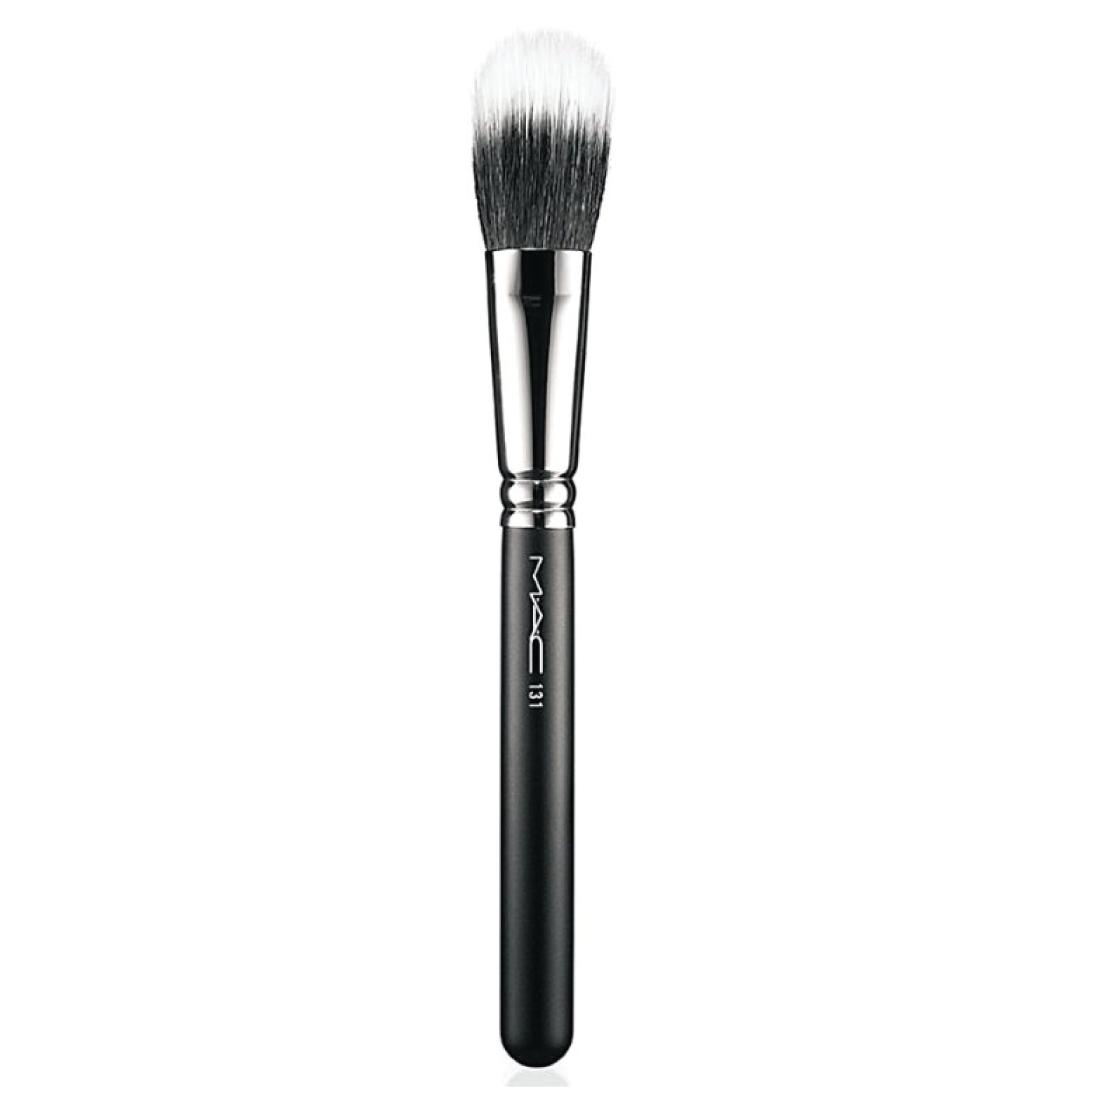 MAC Duo Fibre Powder & Blush Brush 131